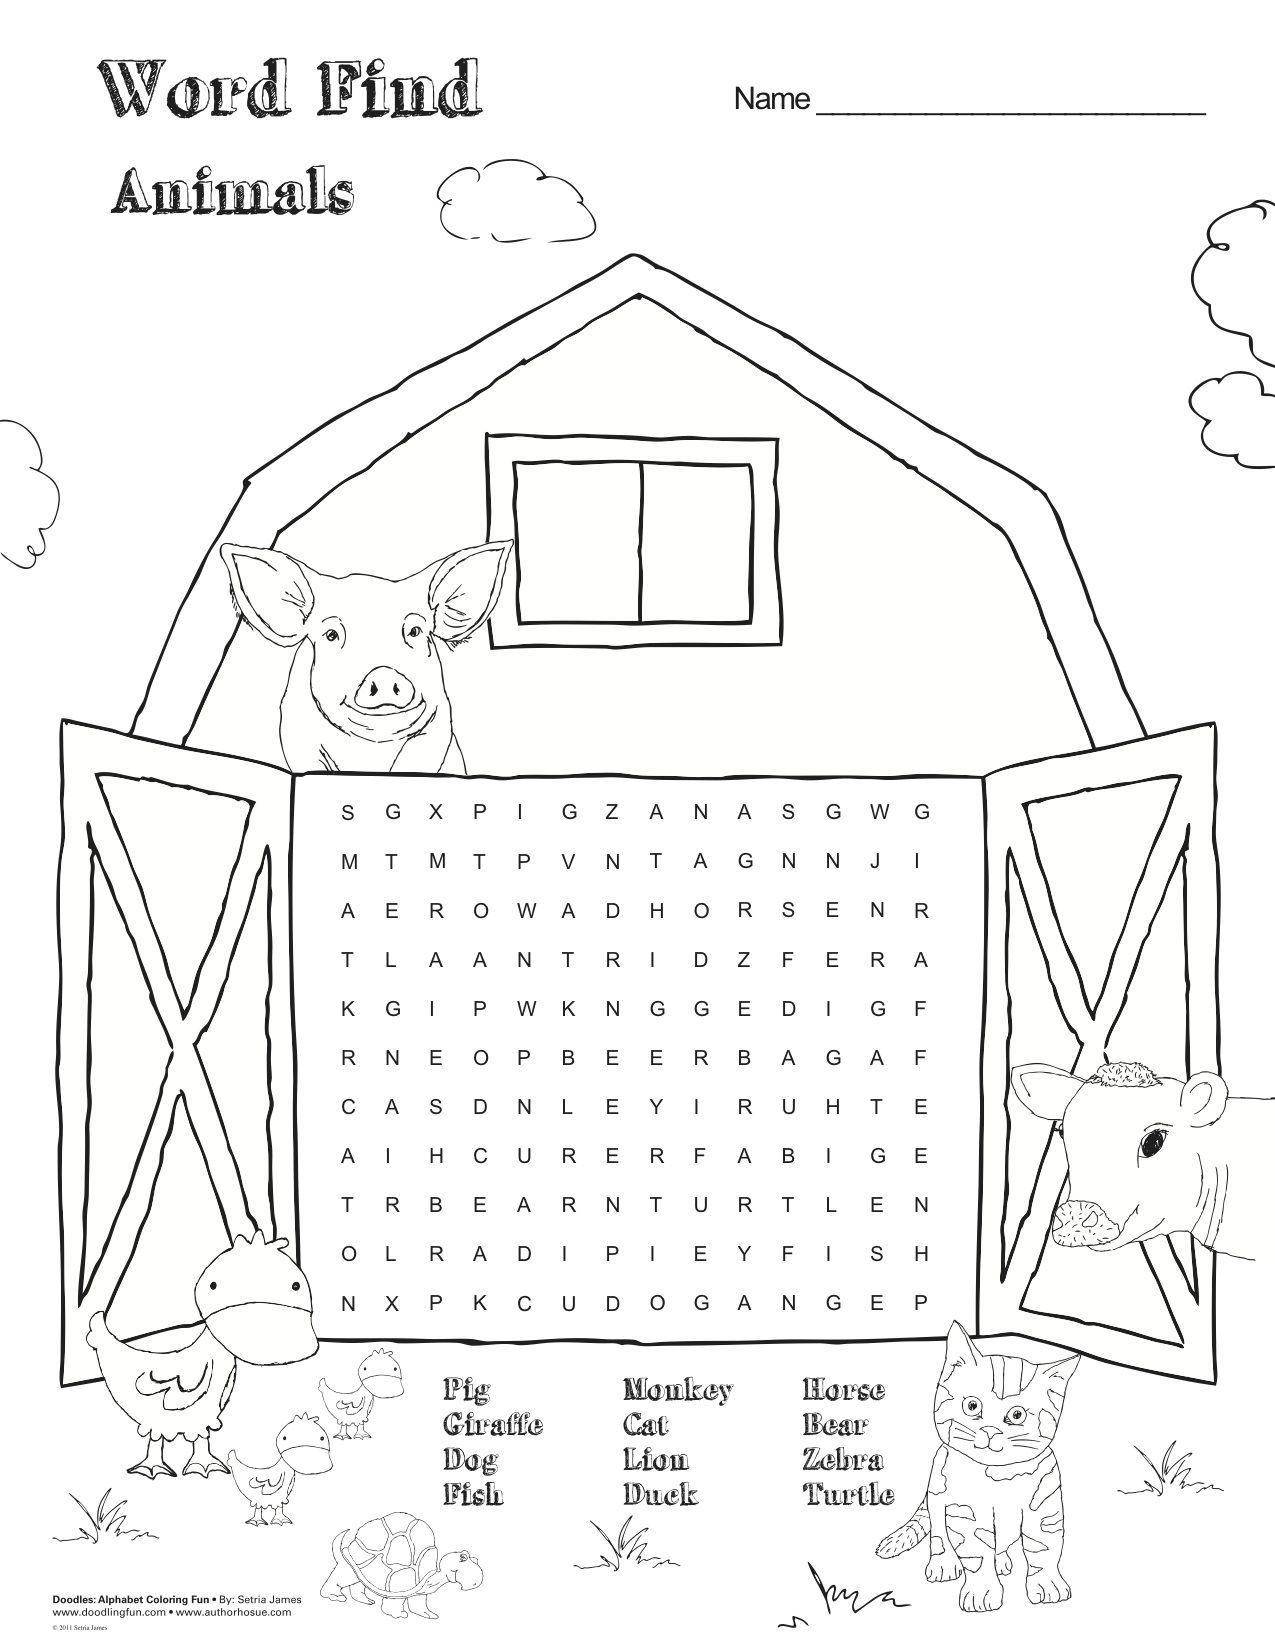 free printable farm animal word find games activities kids parents home delightful. Black Bedroom Furniture Sets. Home Design Ideas